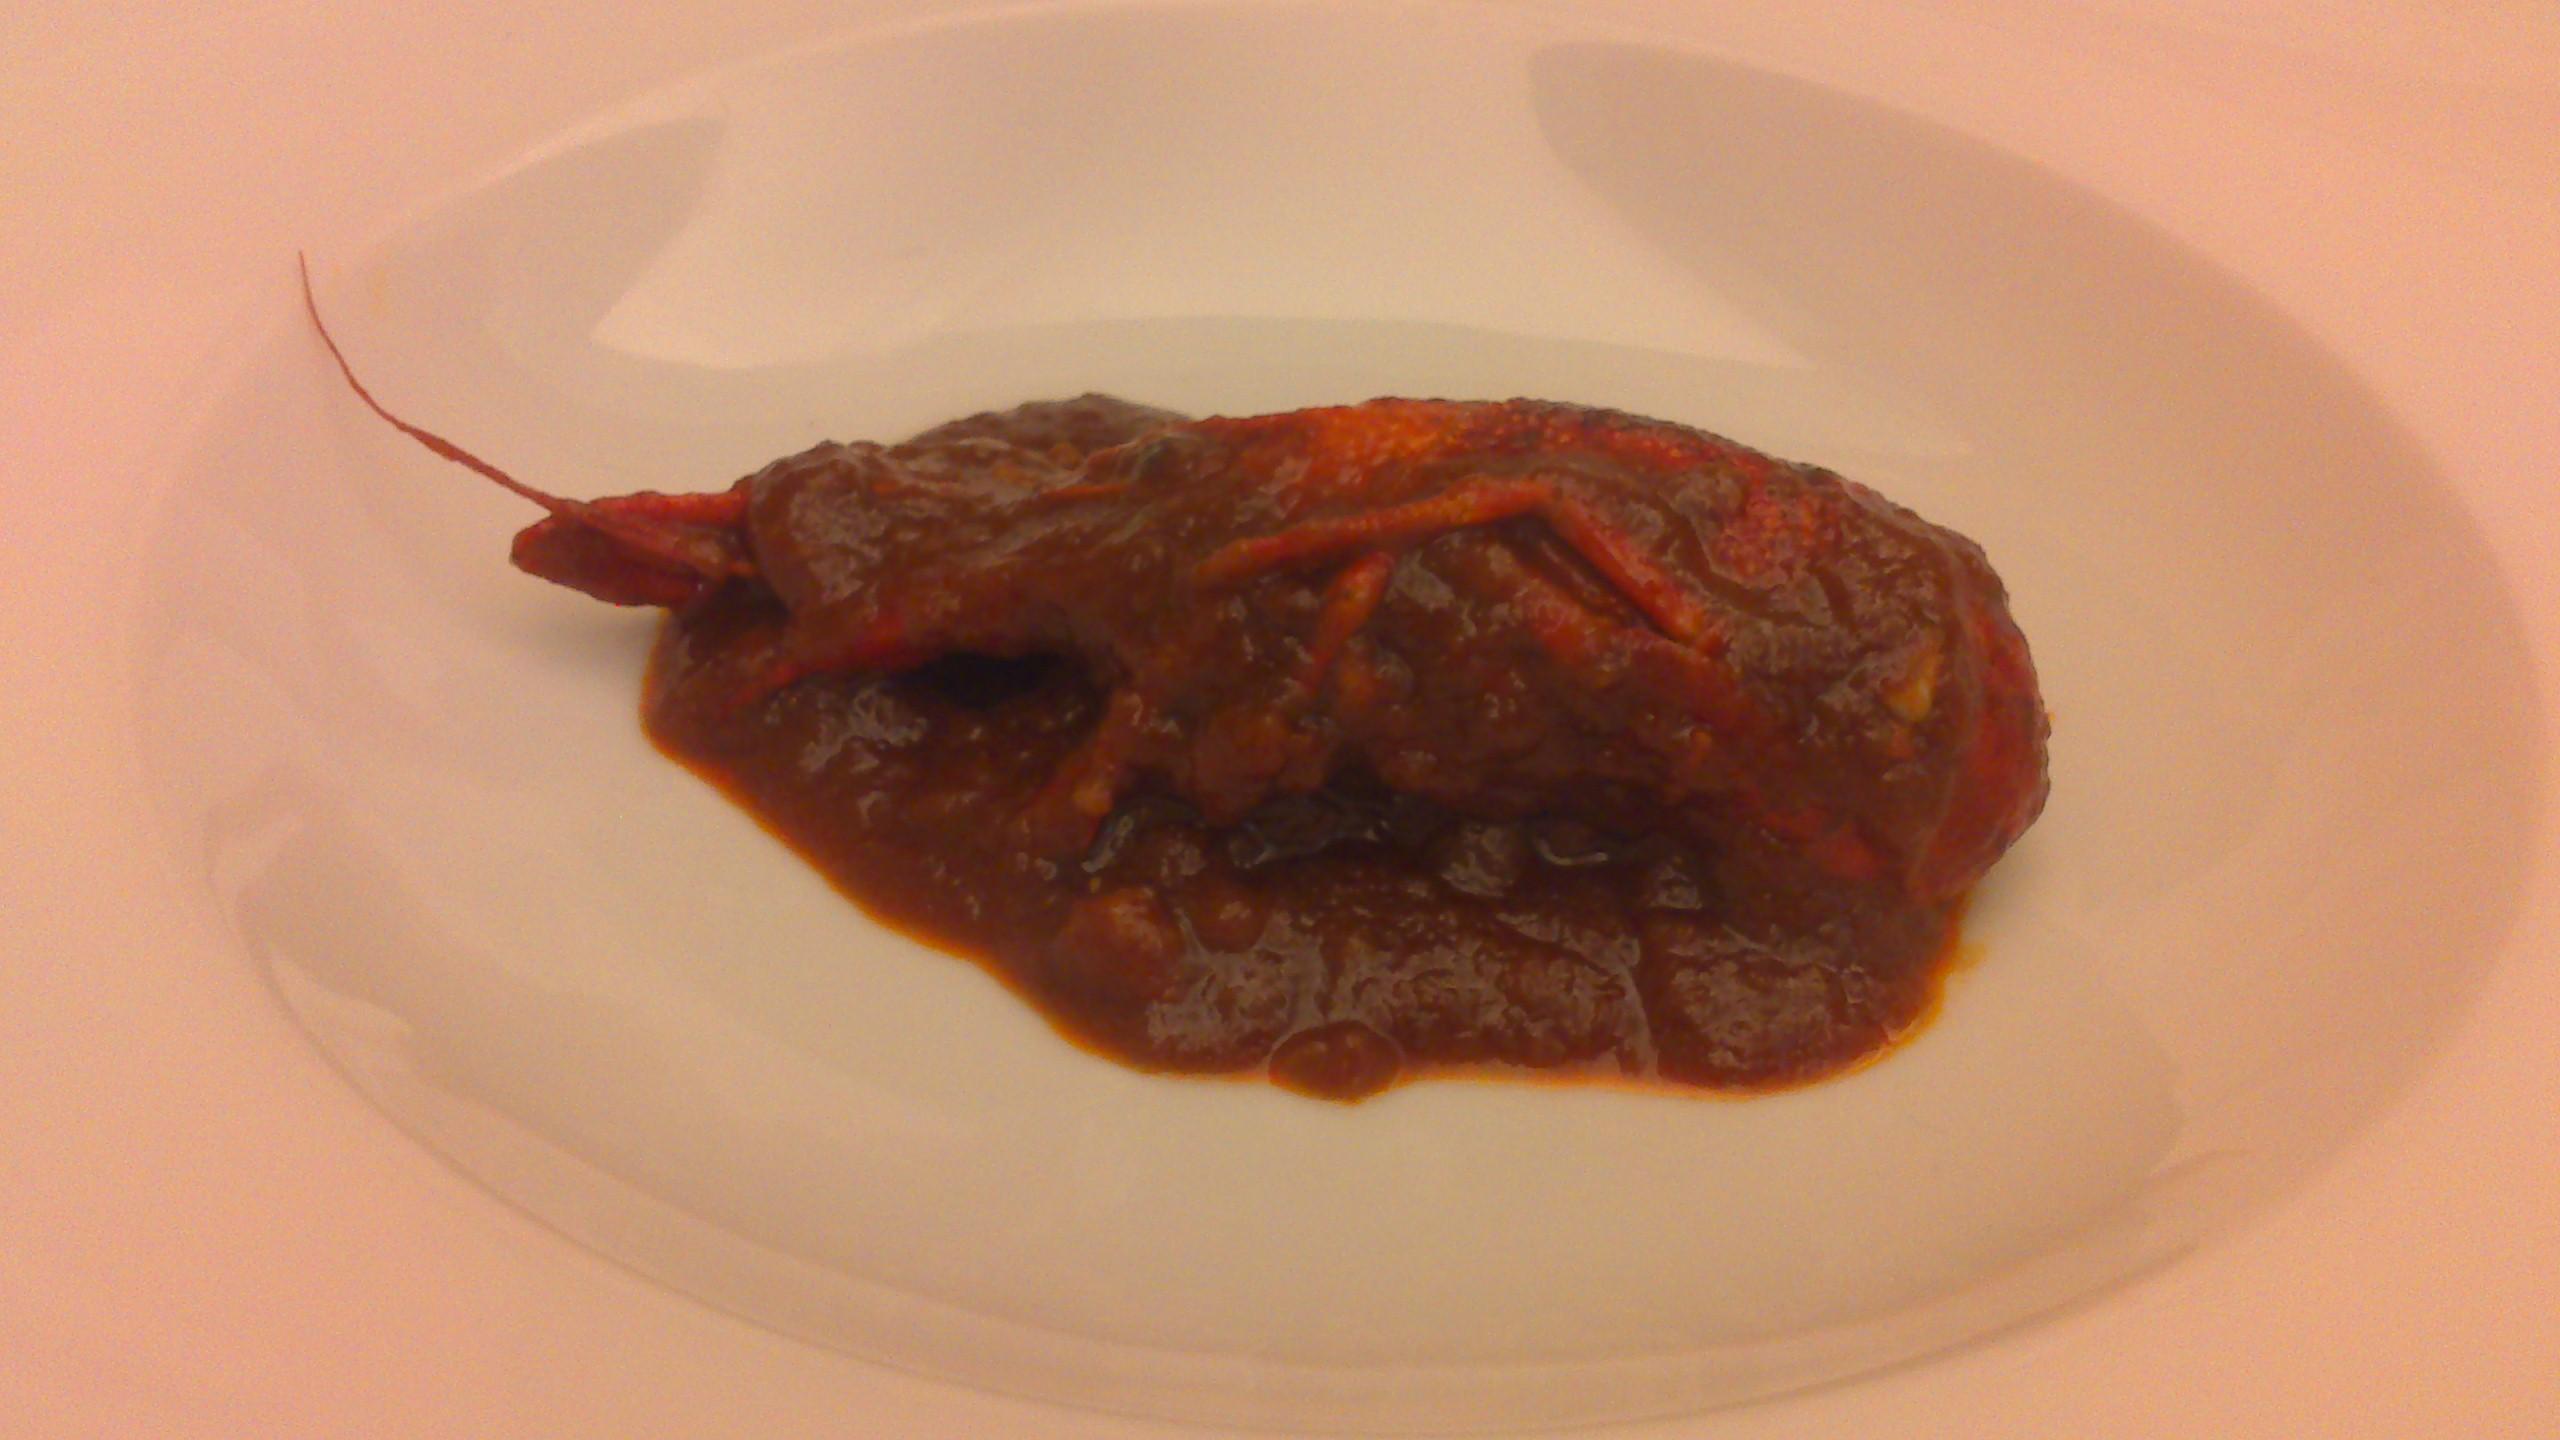 Restaurante Trueba (Vizcaya/Bizkaia) en Bilbao Cangrejo en salsa bizkaina